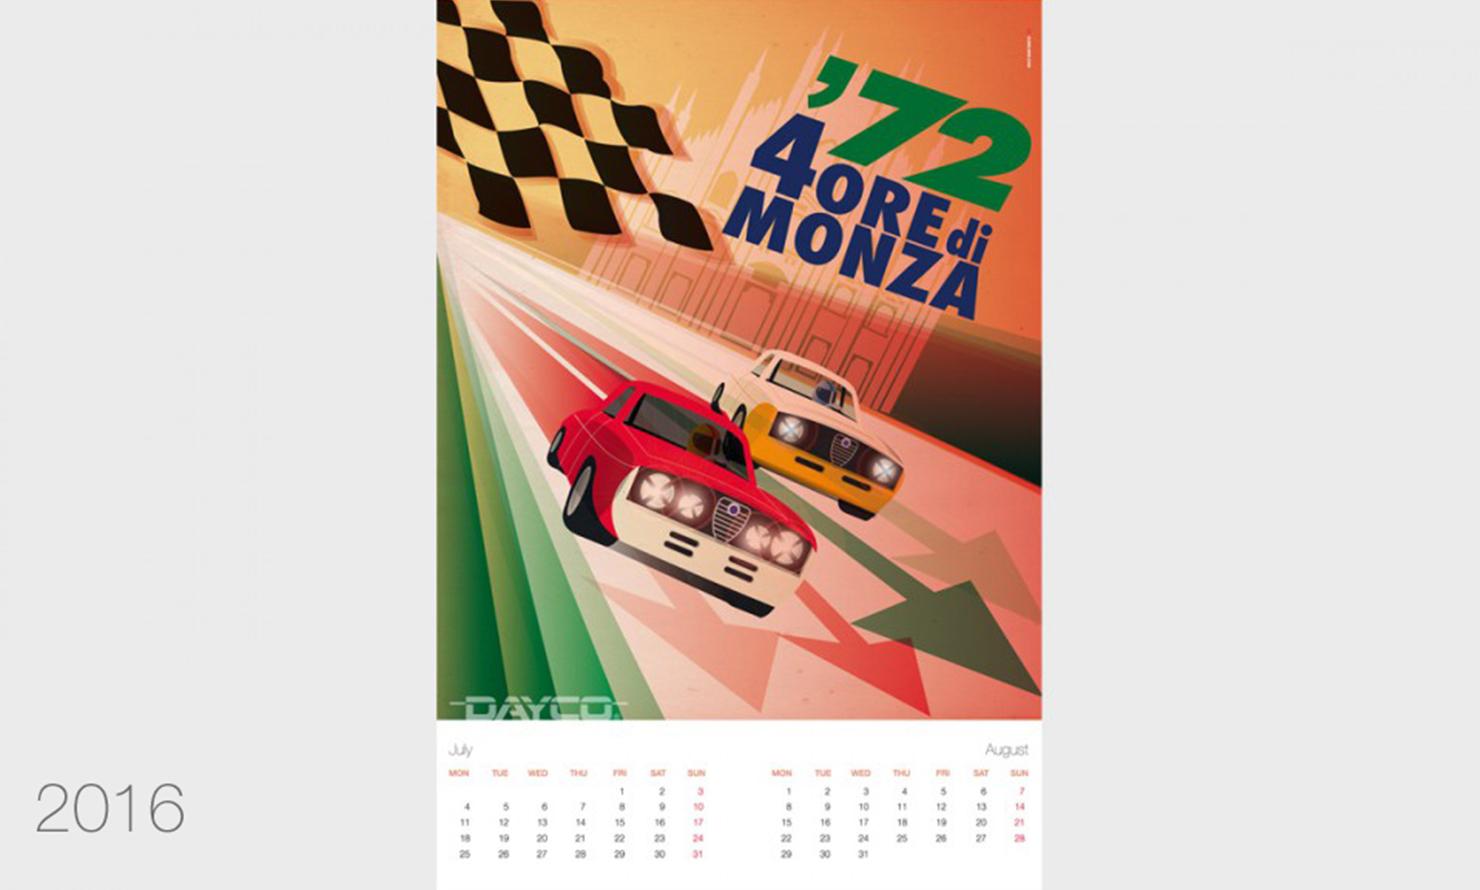 https://www.kubelibre.com/uploads/Slider-work-tutti-clienti/dayco-calendario-2016-4.jpg